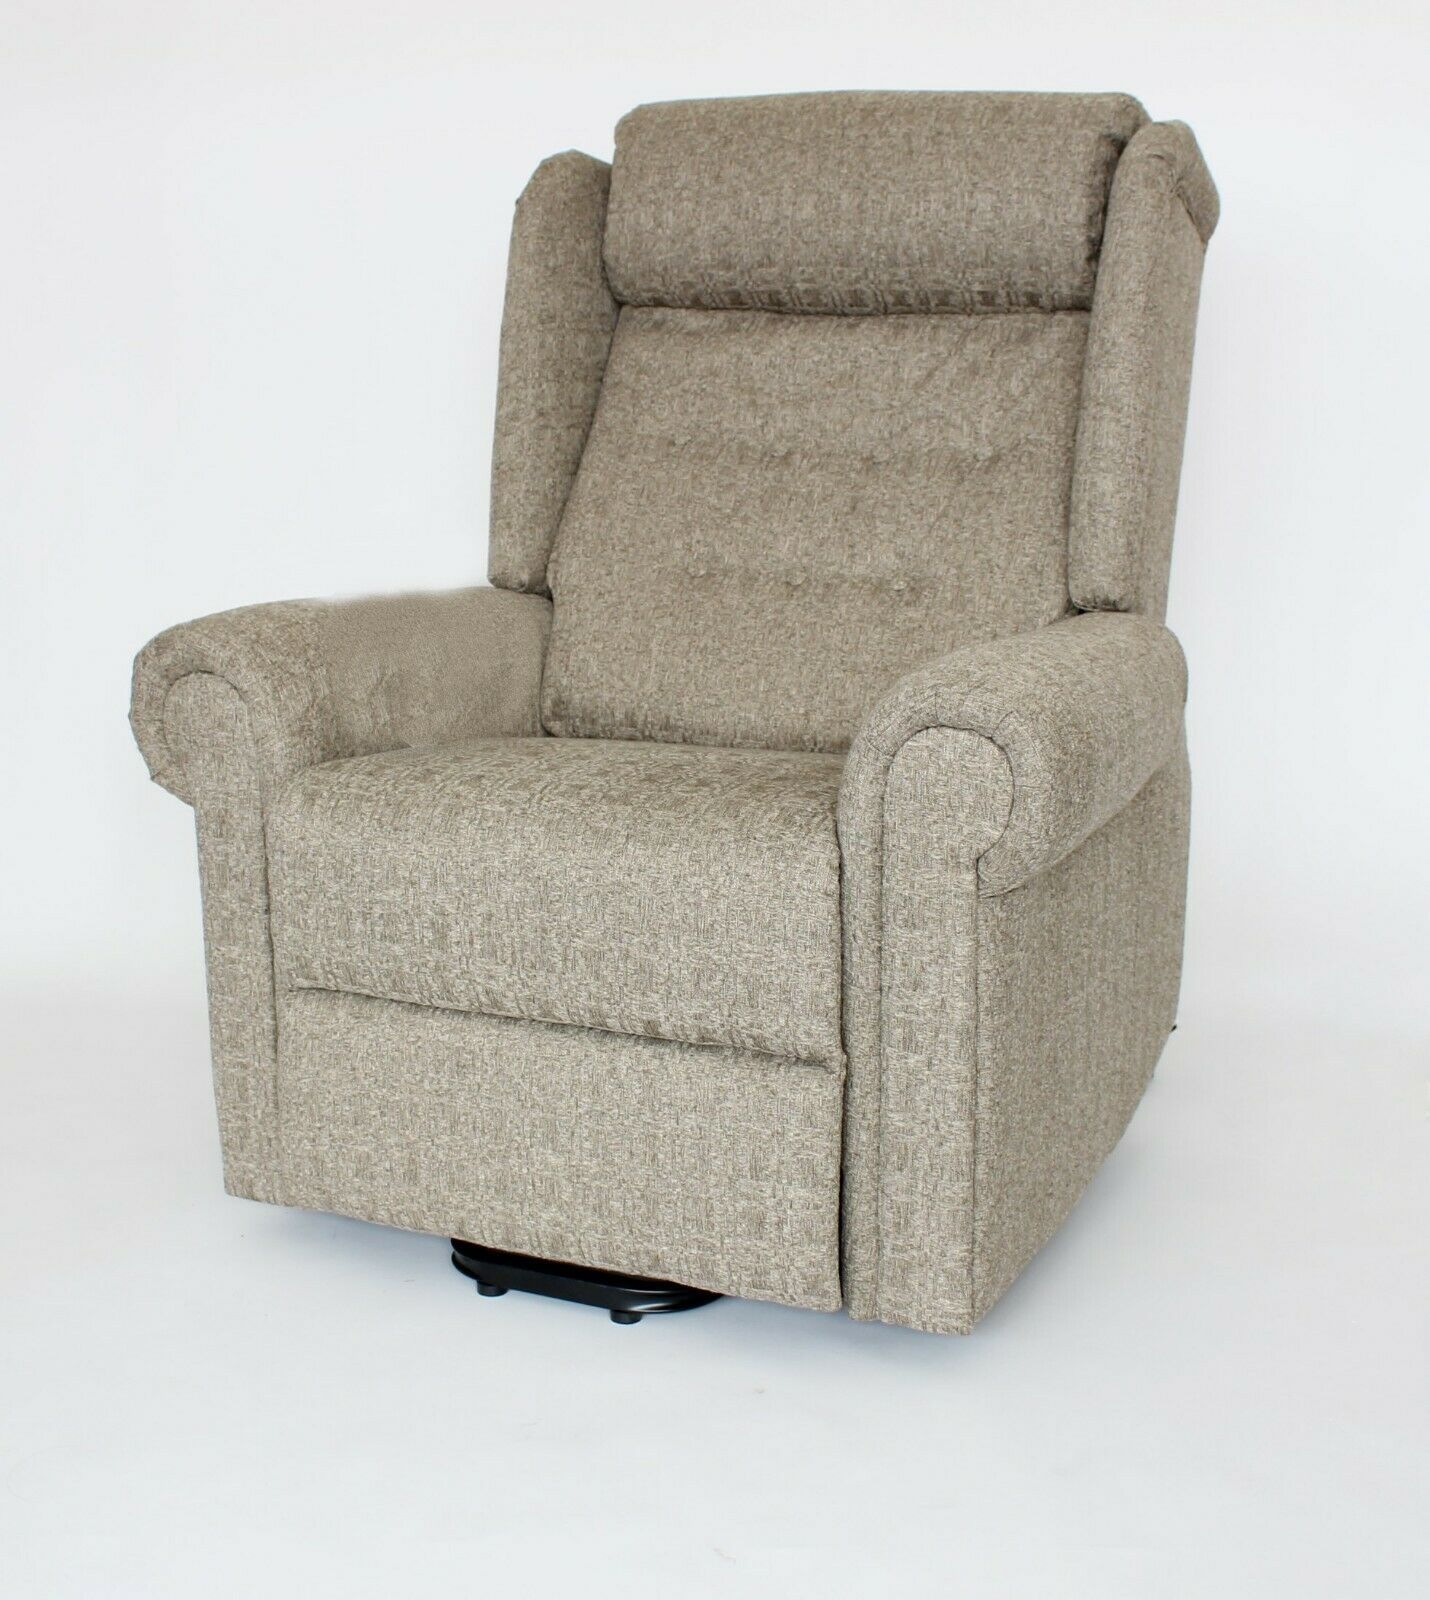 Sessel Relaxsessel Liegefunktion Seitentasche Ebay In 2020 Sessel Relaxsessel Sessel Mit Hocker